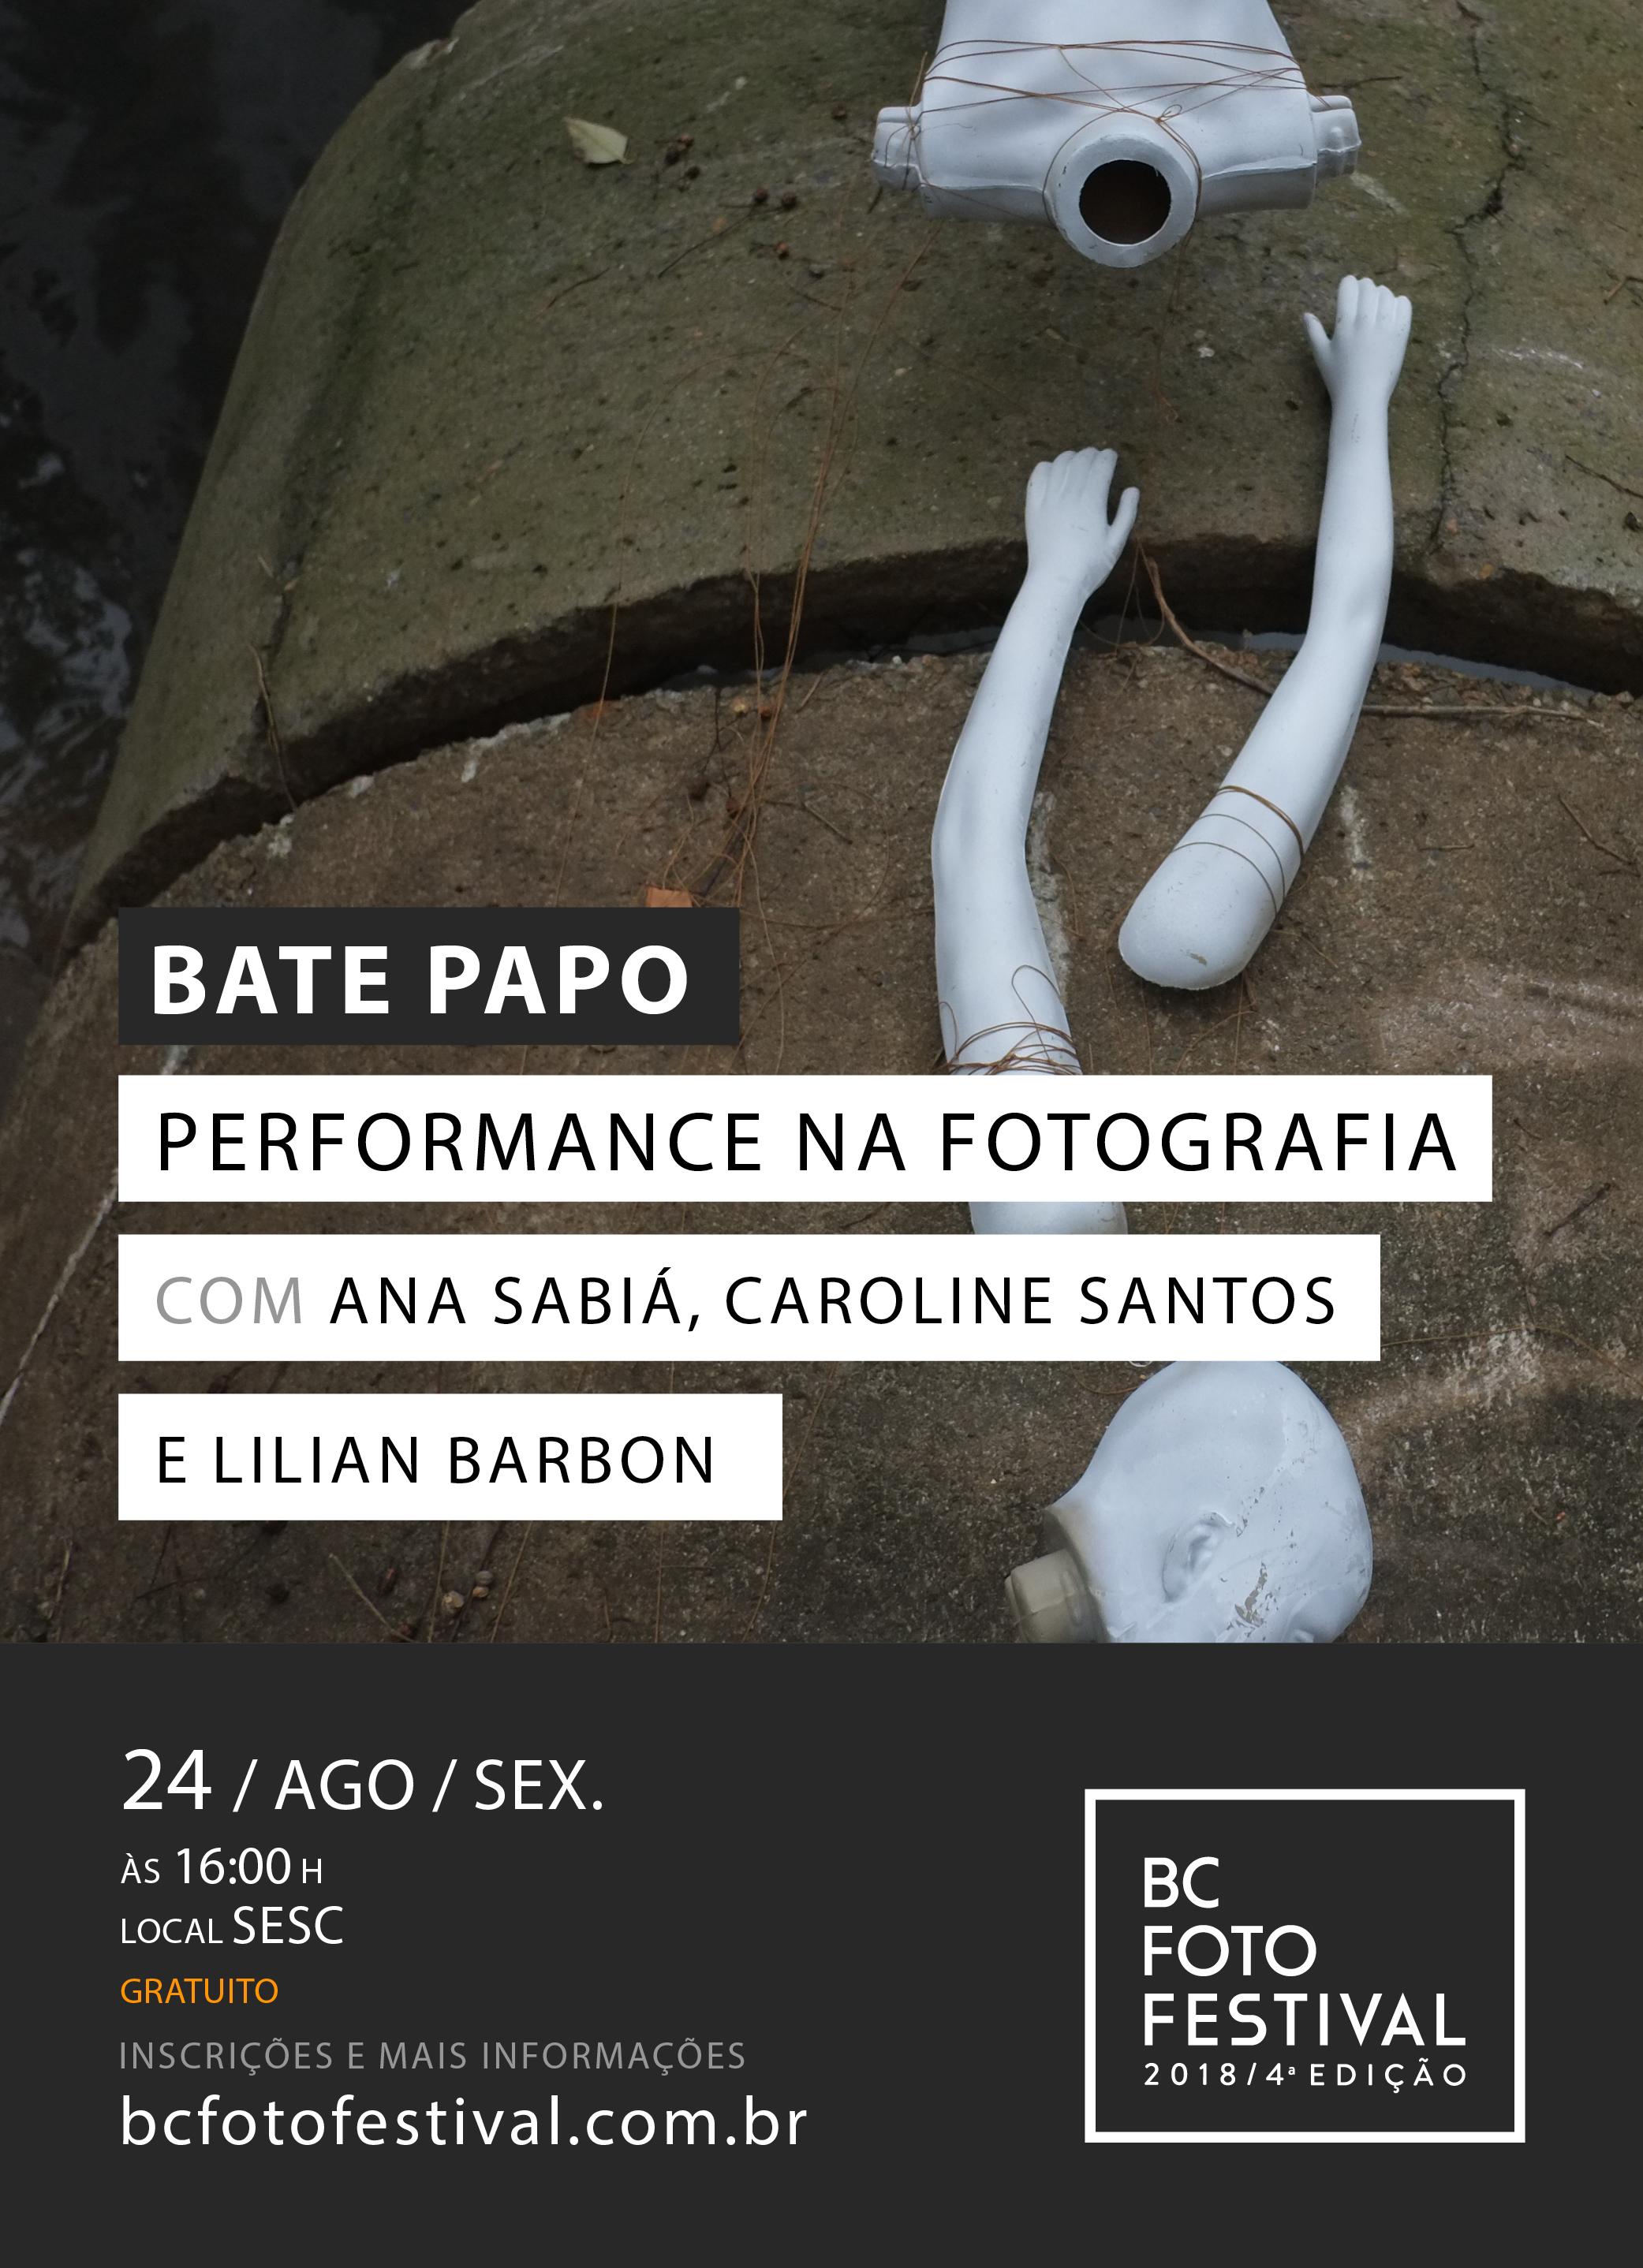 Bate-papo – Performance na Fotografia